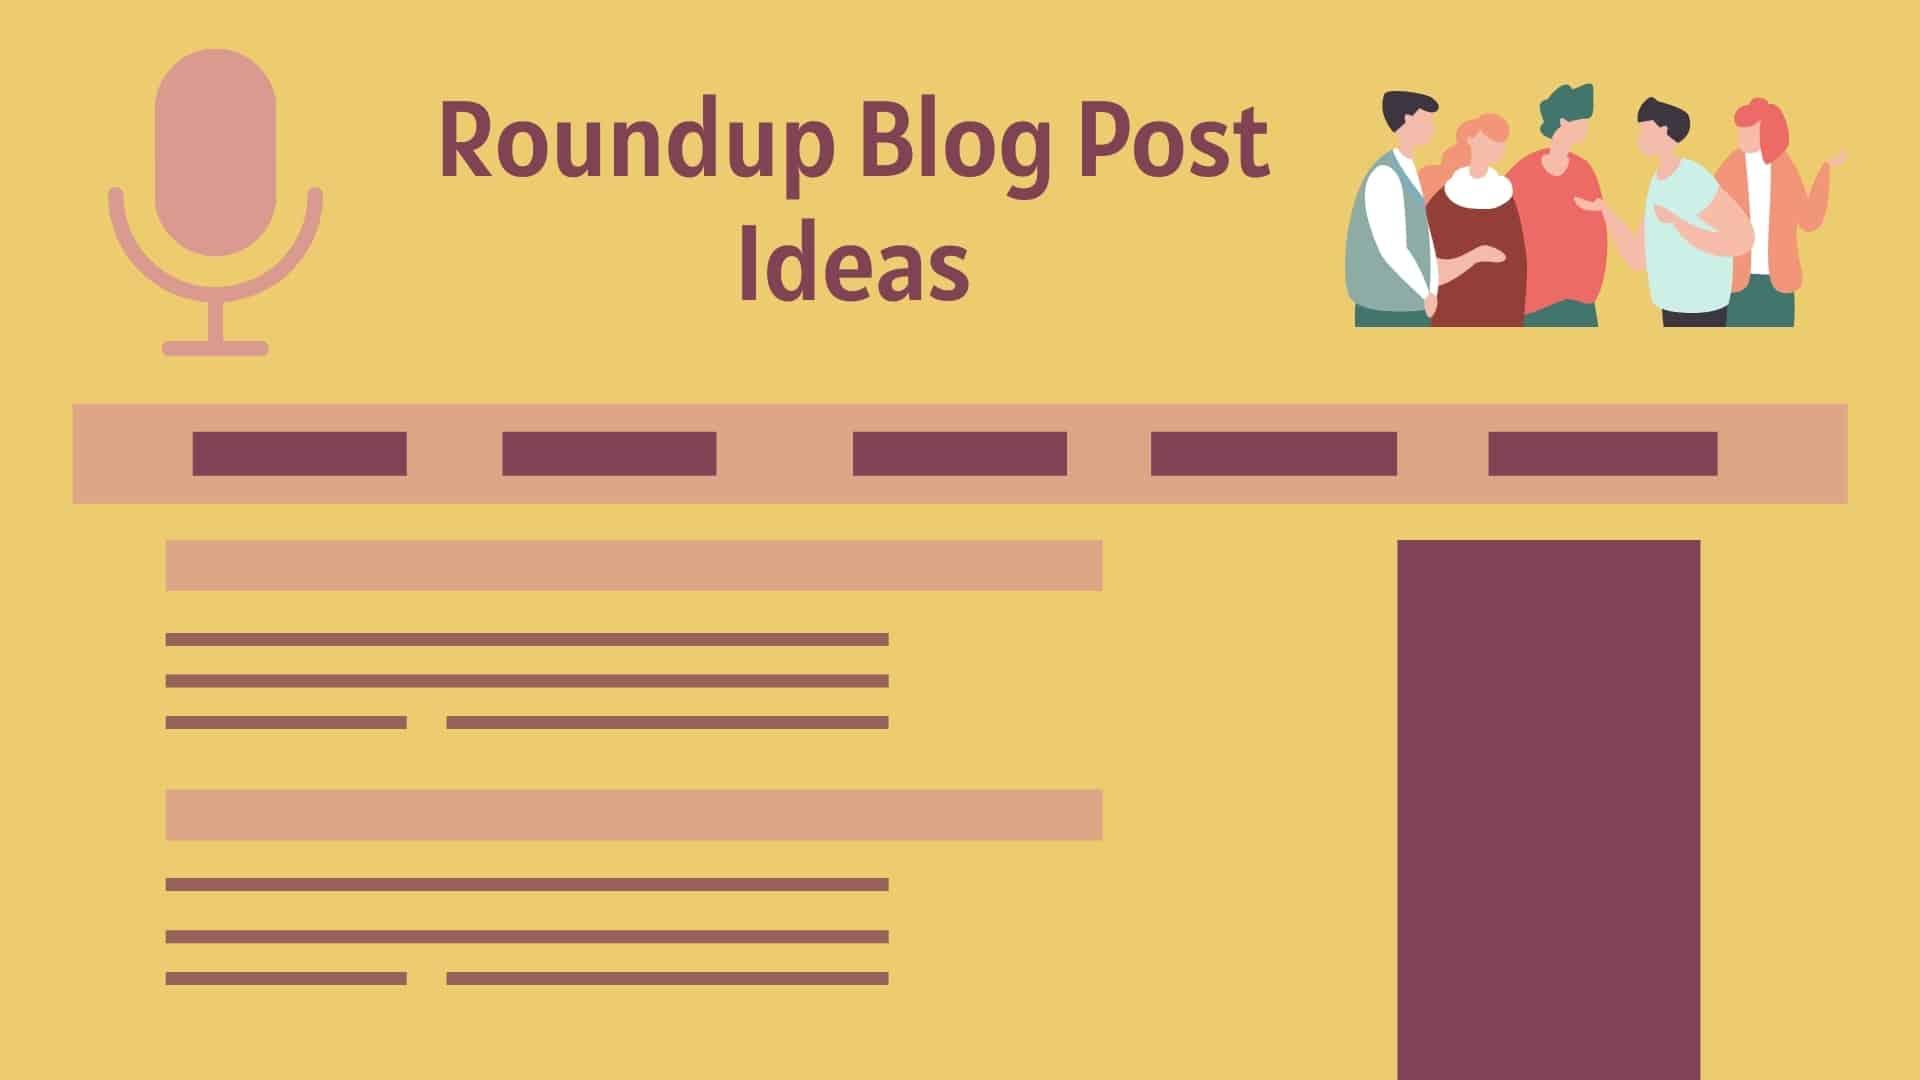 Roundup Blog Post Ideas - Find Expert Roundup Blog Topic Ideas and Blog Post Ideas to Write About